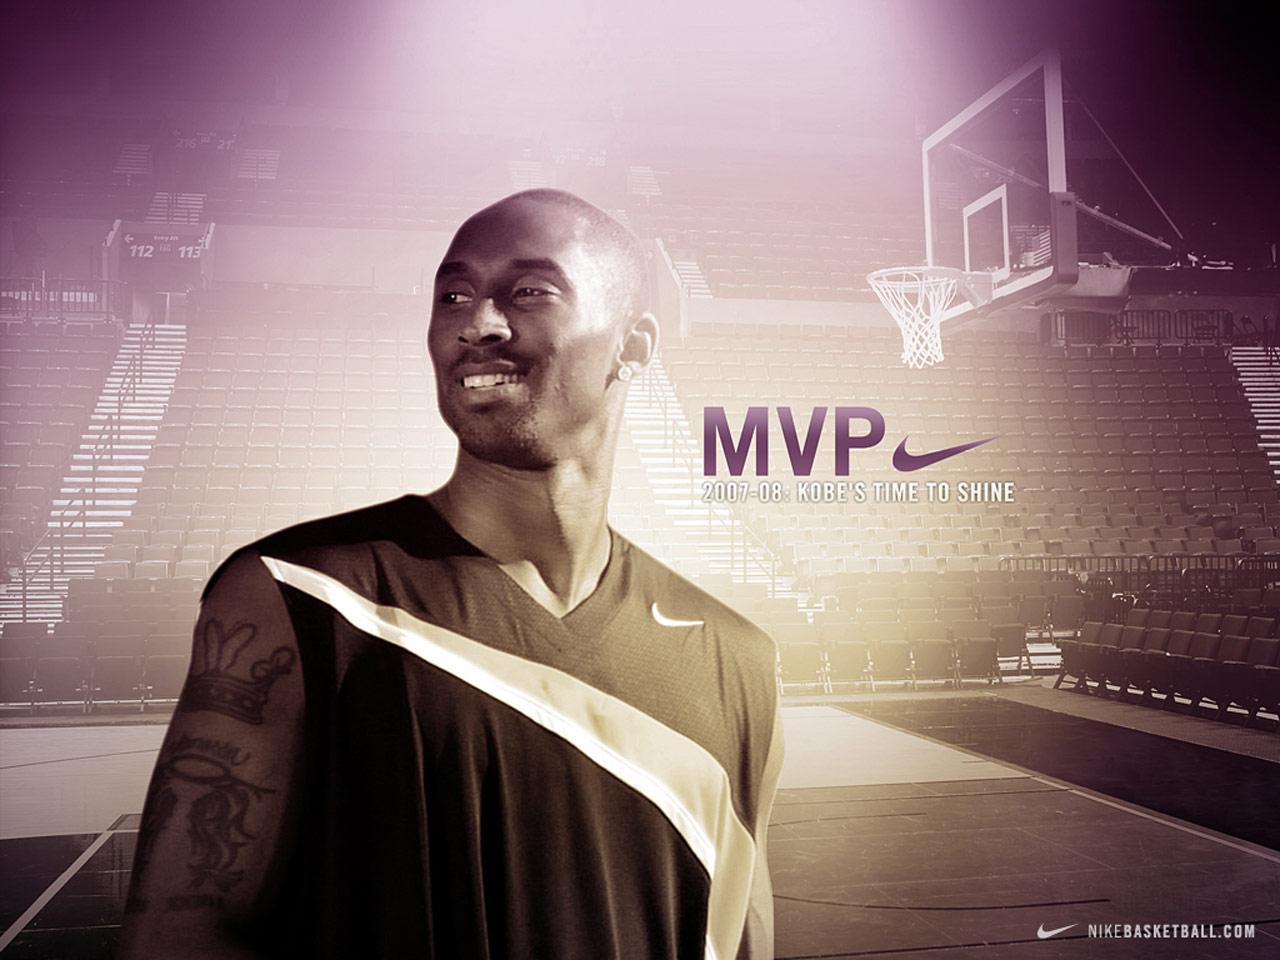 Kobe-Bryant-MVP-Nikebasketball-Wallpaper.jpg